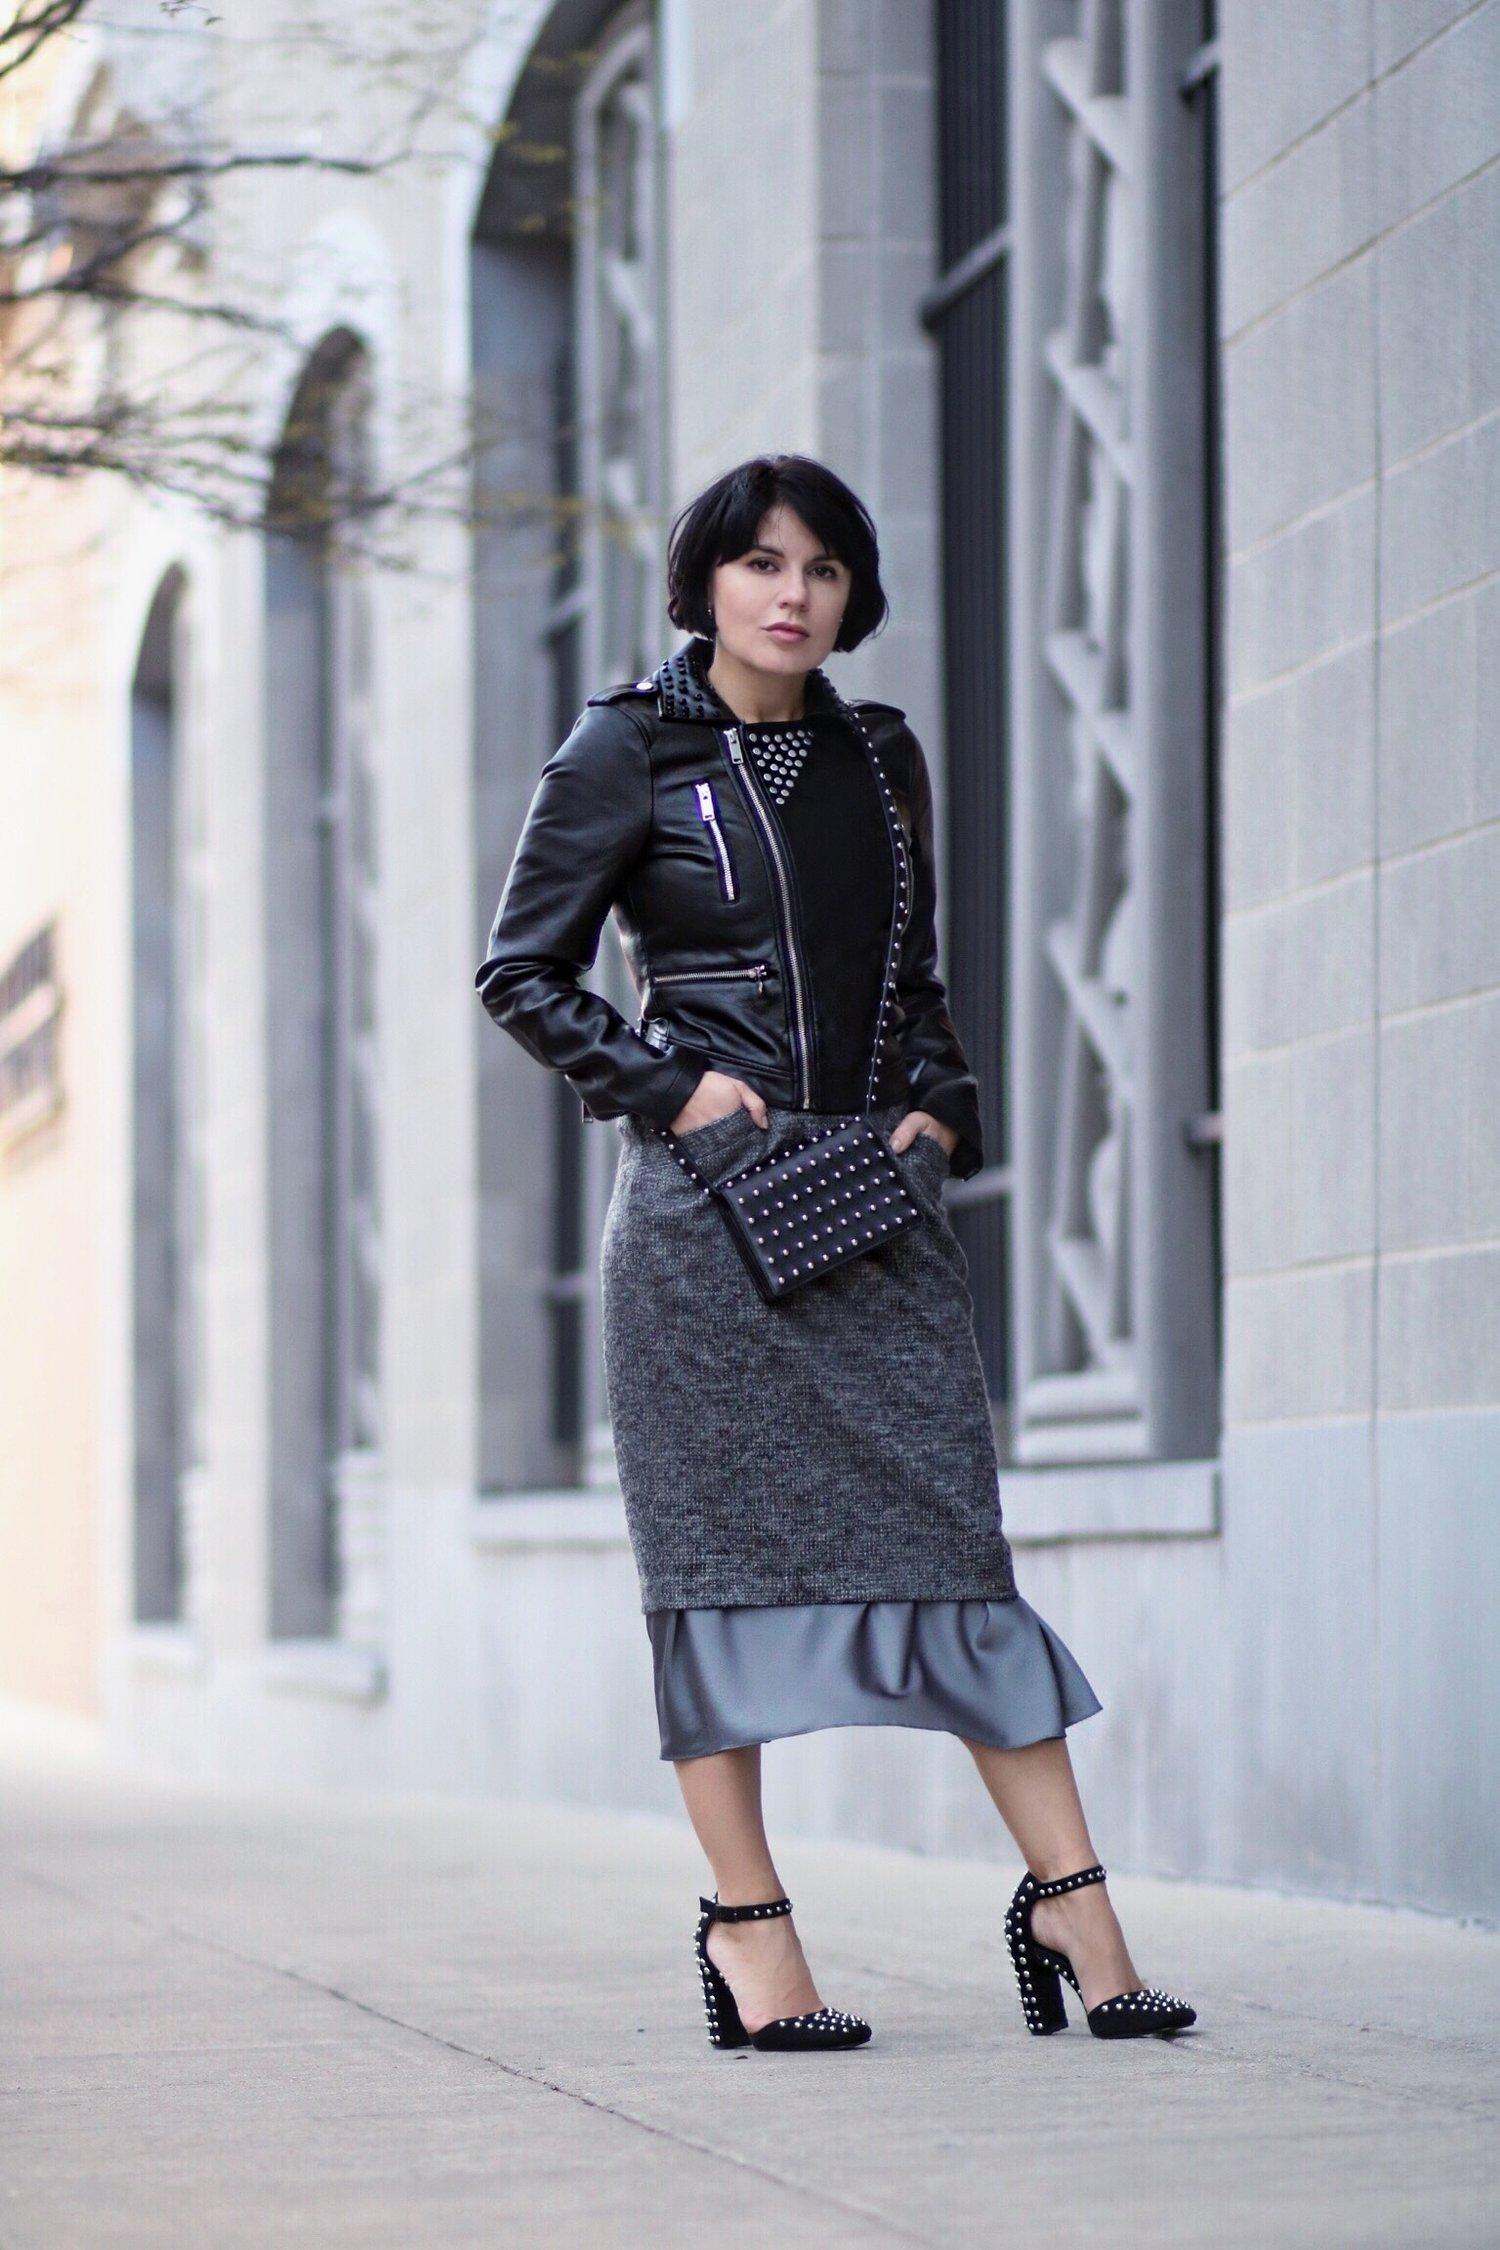 Alexander Wang studded bag blogger style